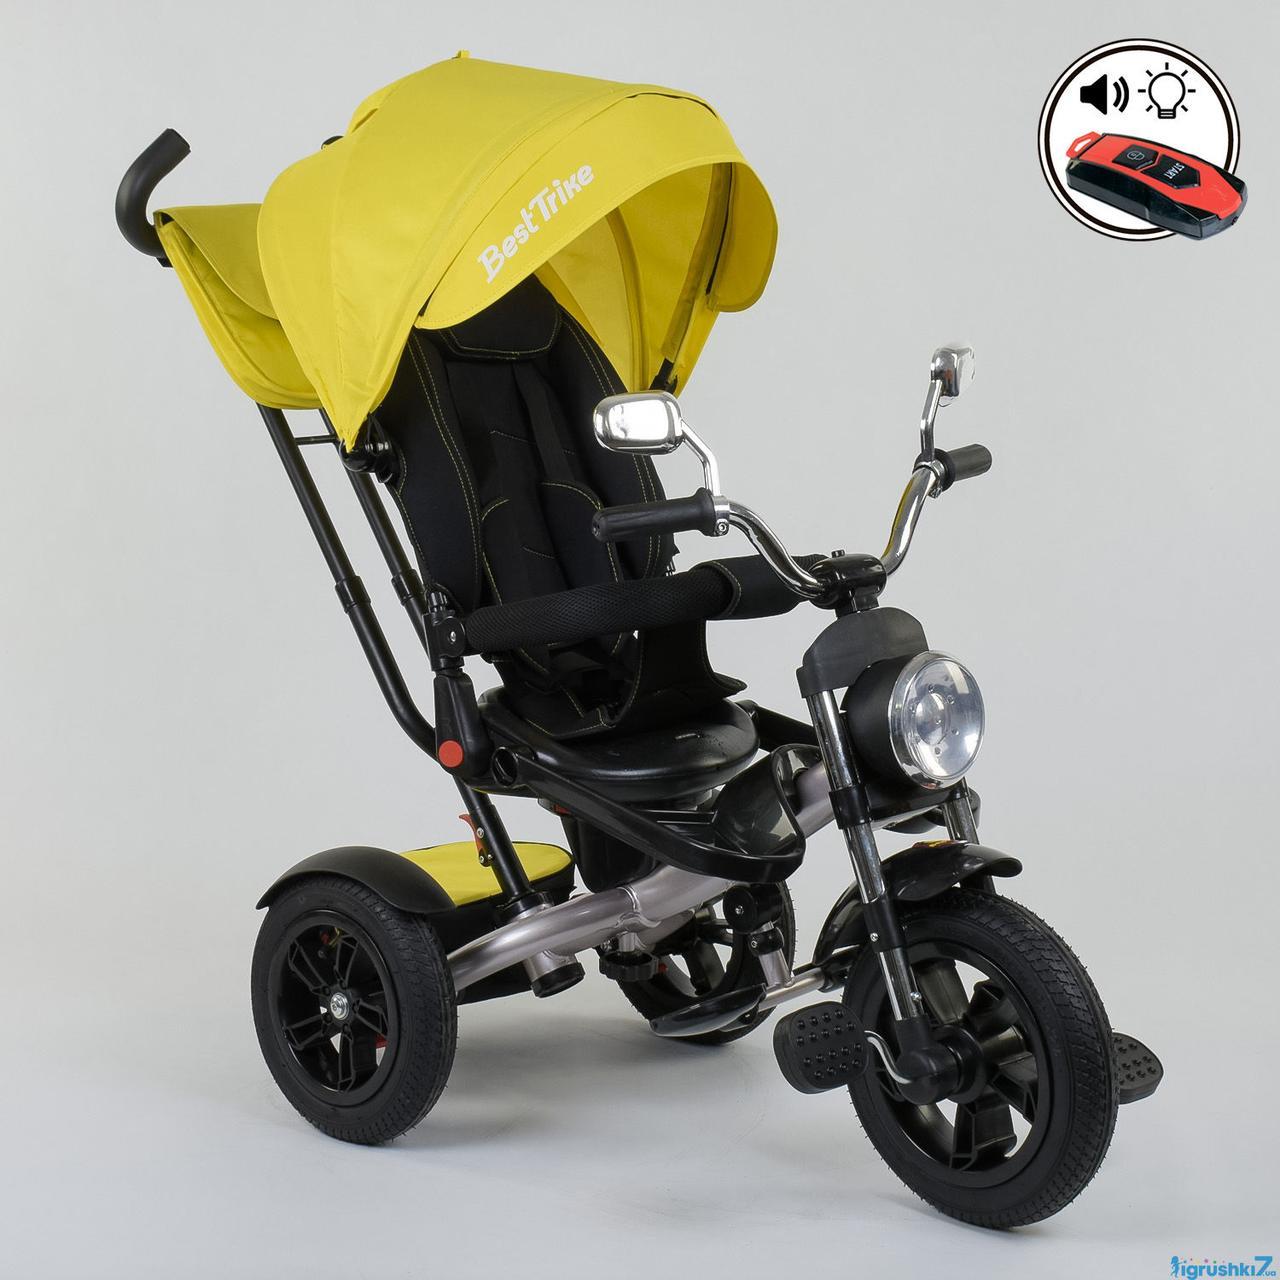 Трехколесный велосипед Best Trike 4490 - 3948 yellow 2019